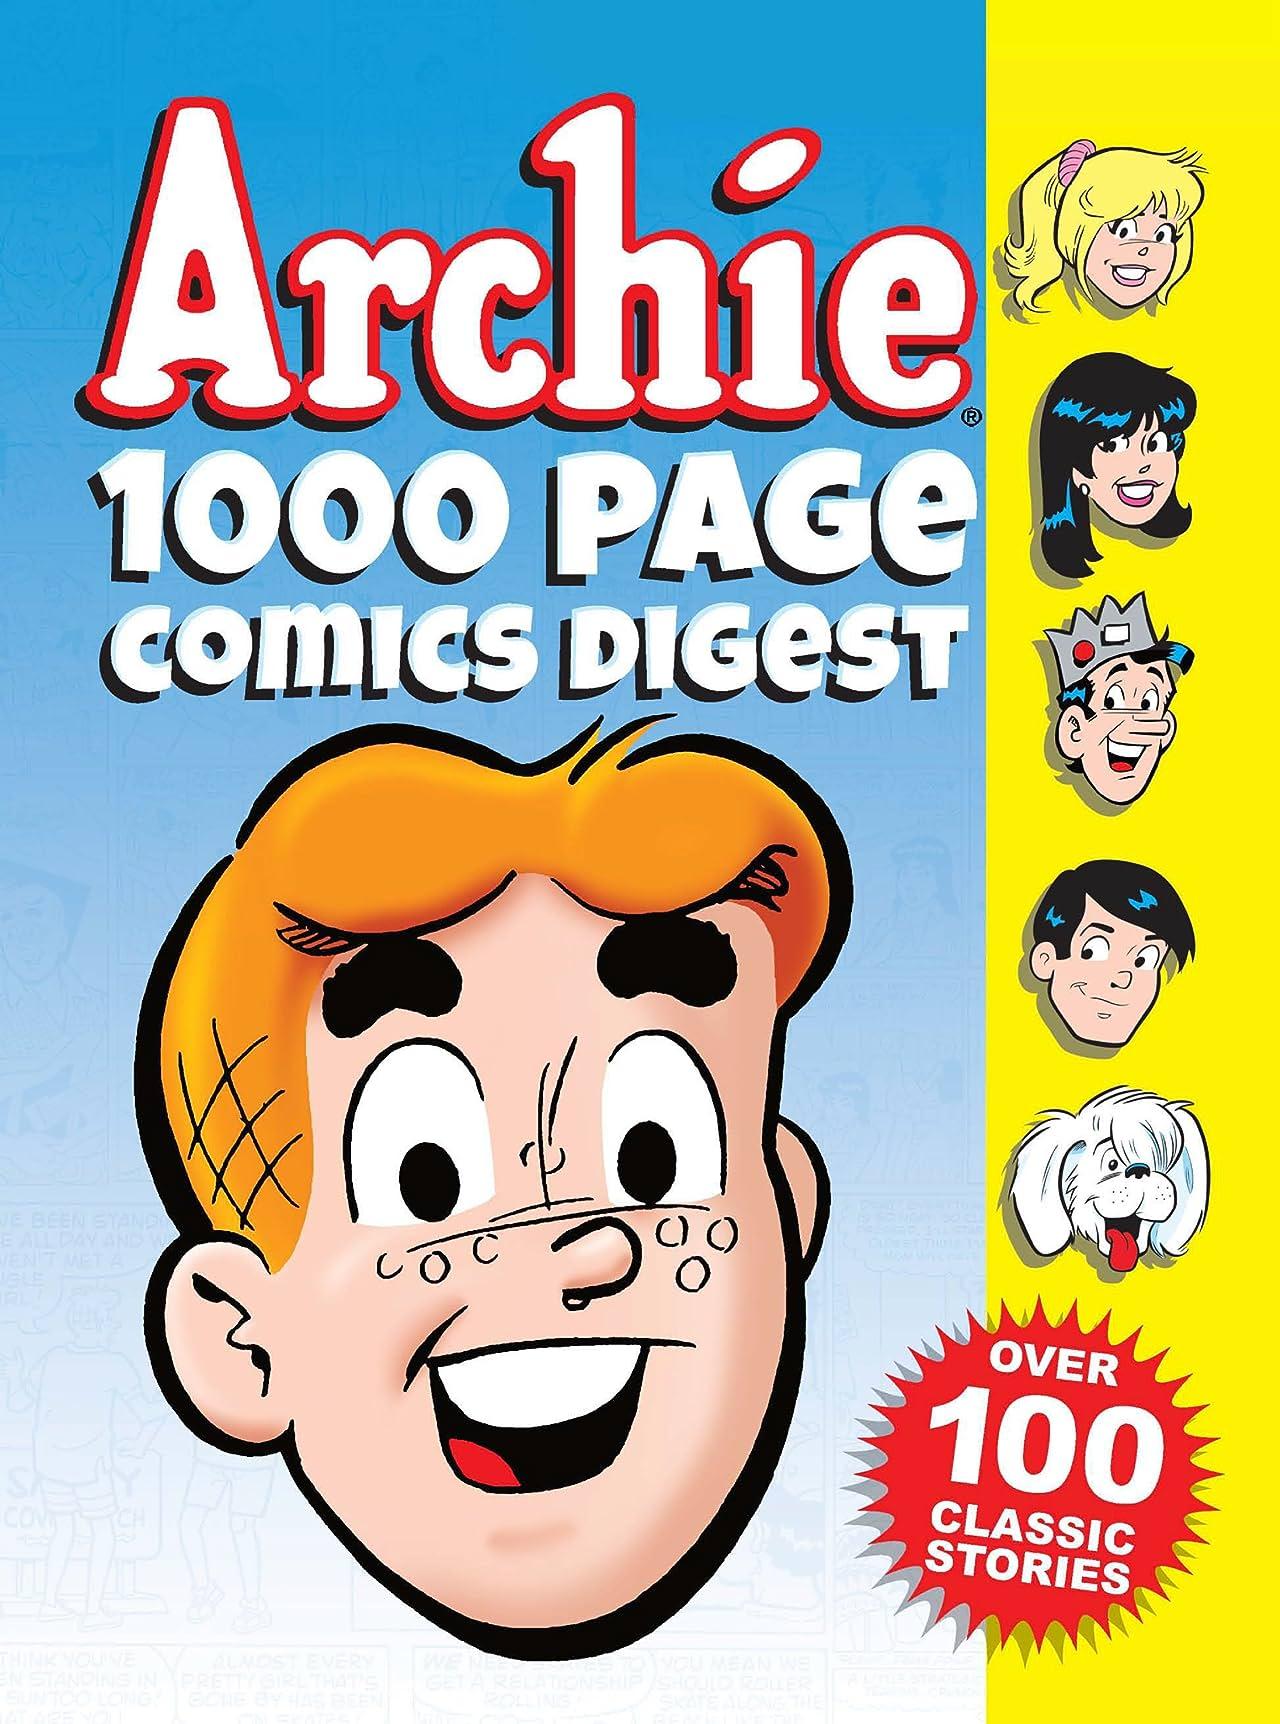 Archie 1000 Page Digest